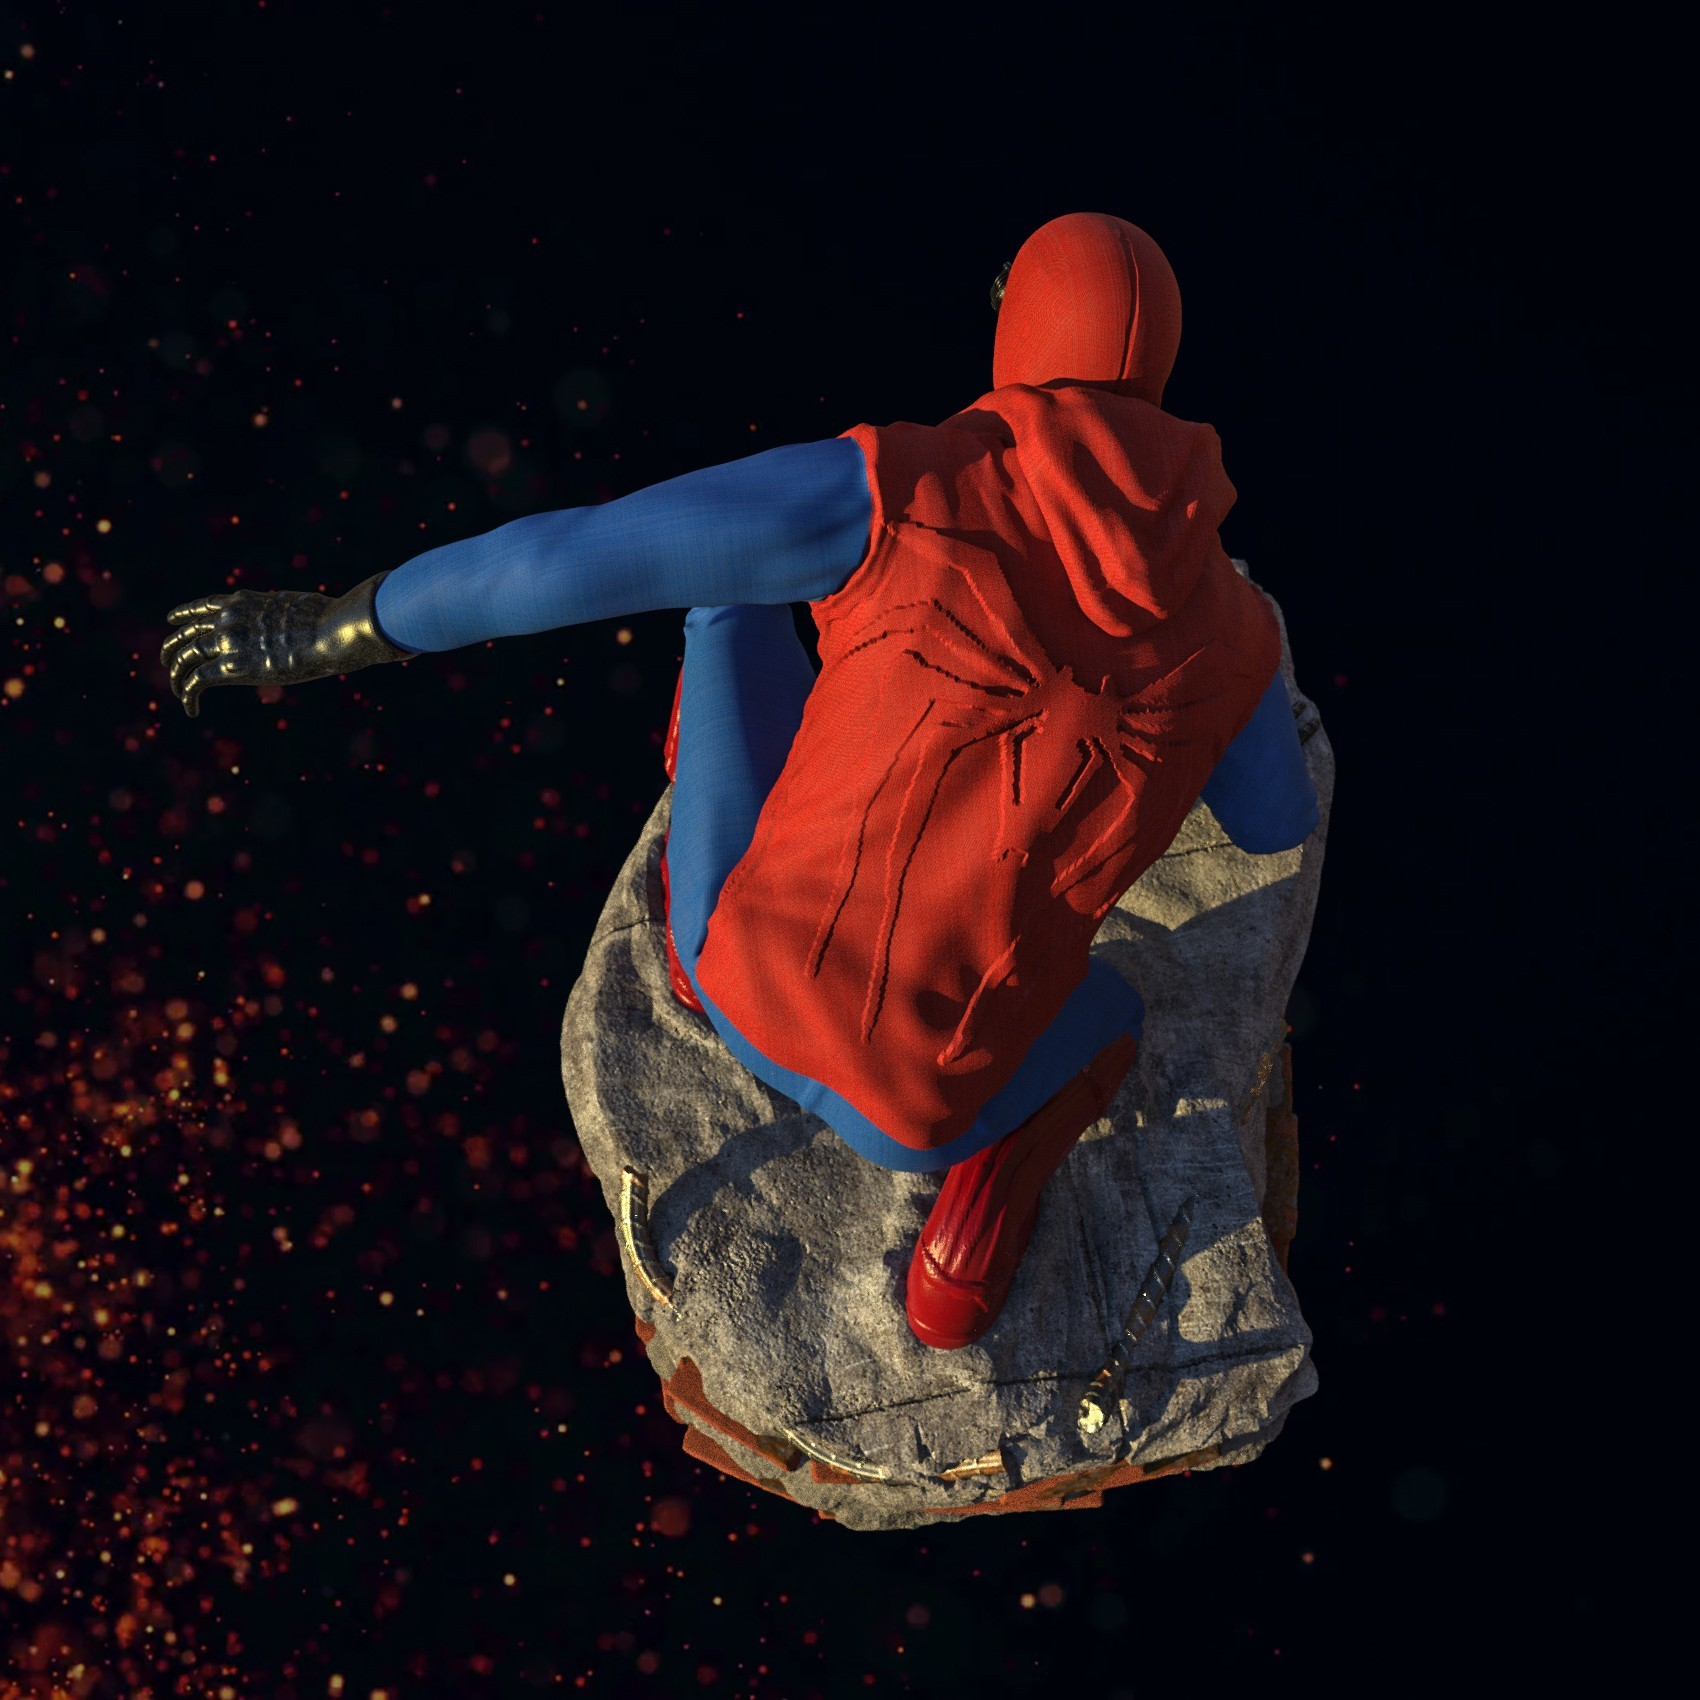 8.jpg Download STL file Spider-Man Homemade Suit • Design to 3D print, tolgaaxu